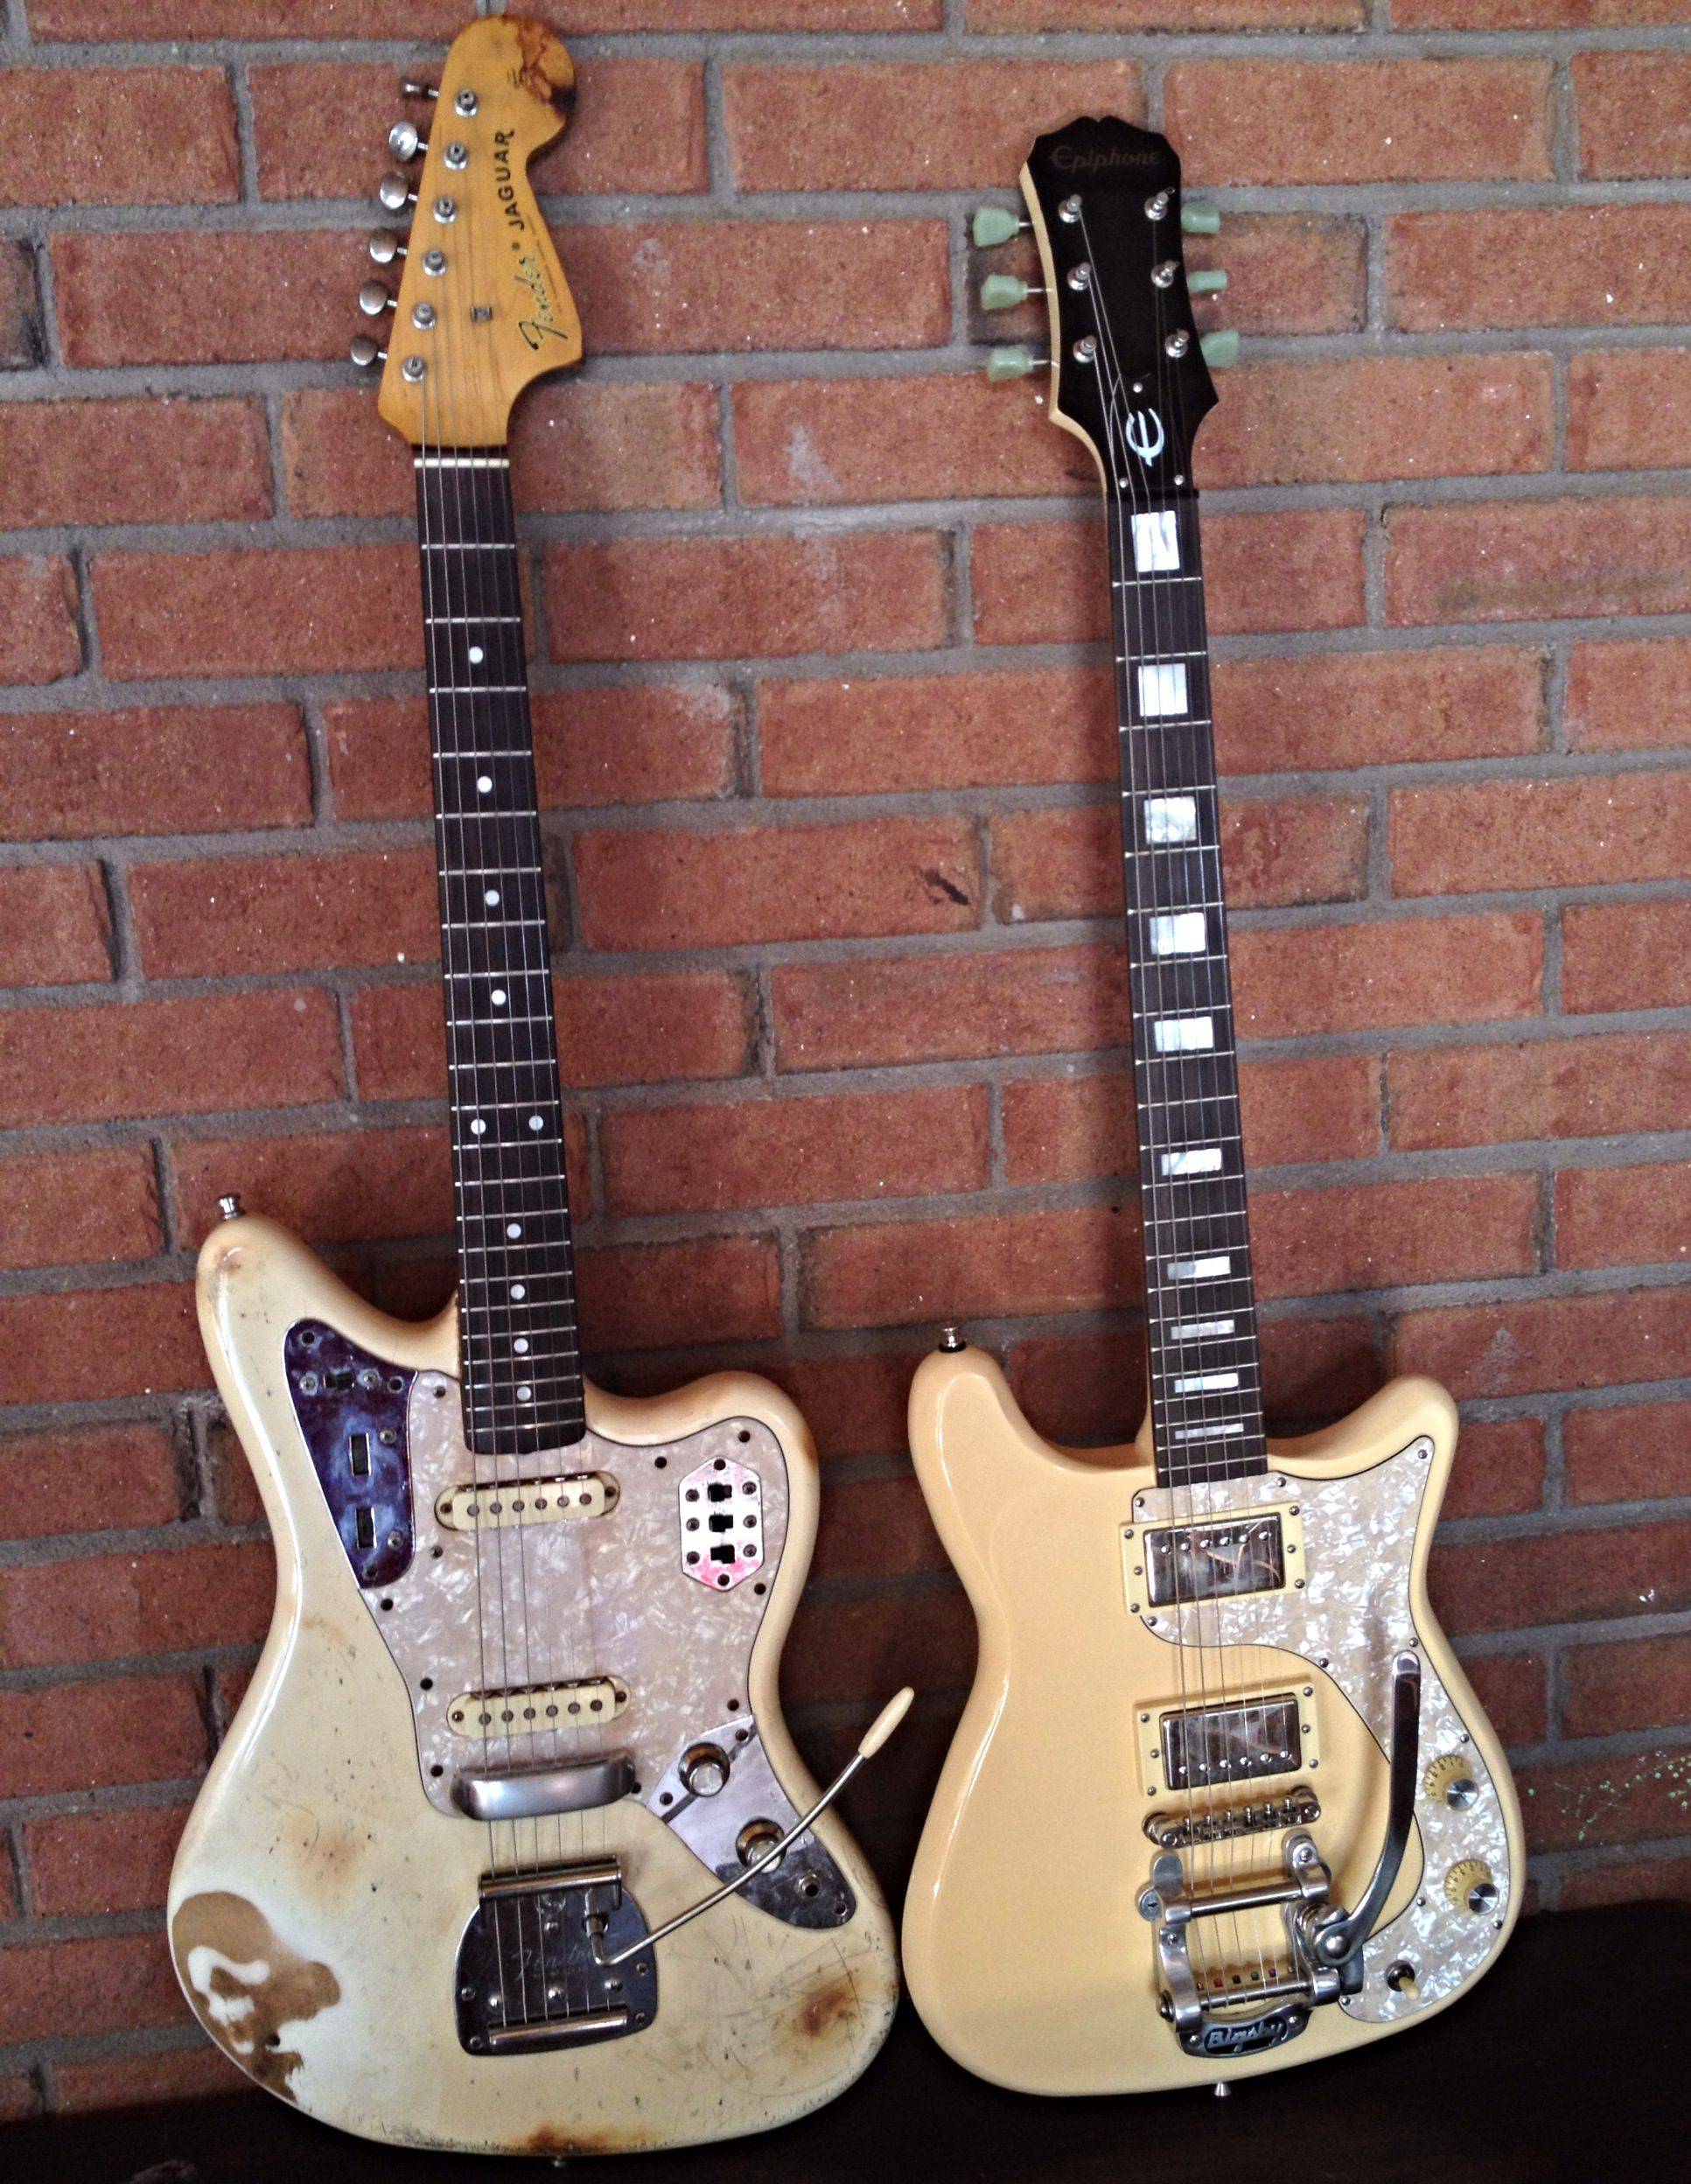 '86 MIJ Jag and Epiphone Wilshire Phant-O-Matic.   Guitars ...: https://www.pinterest.com/pin/289356344781979657/